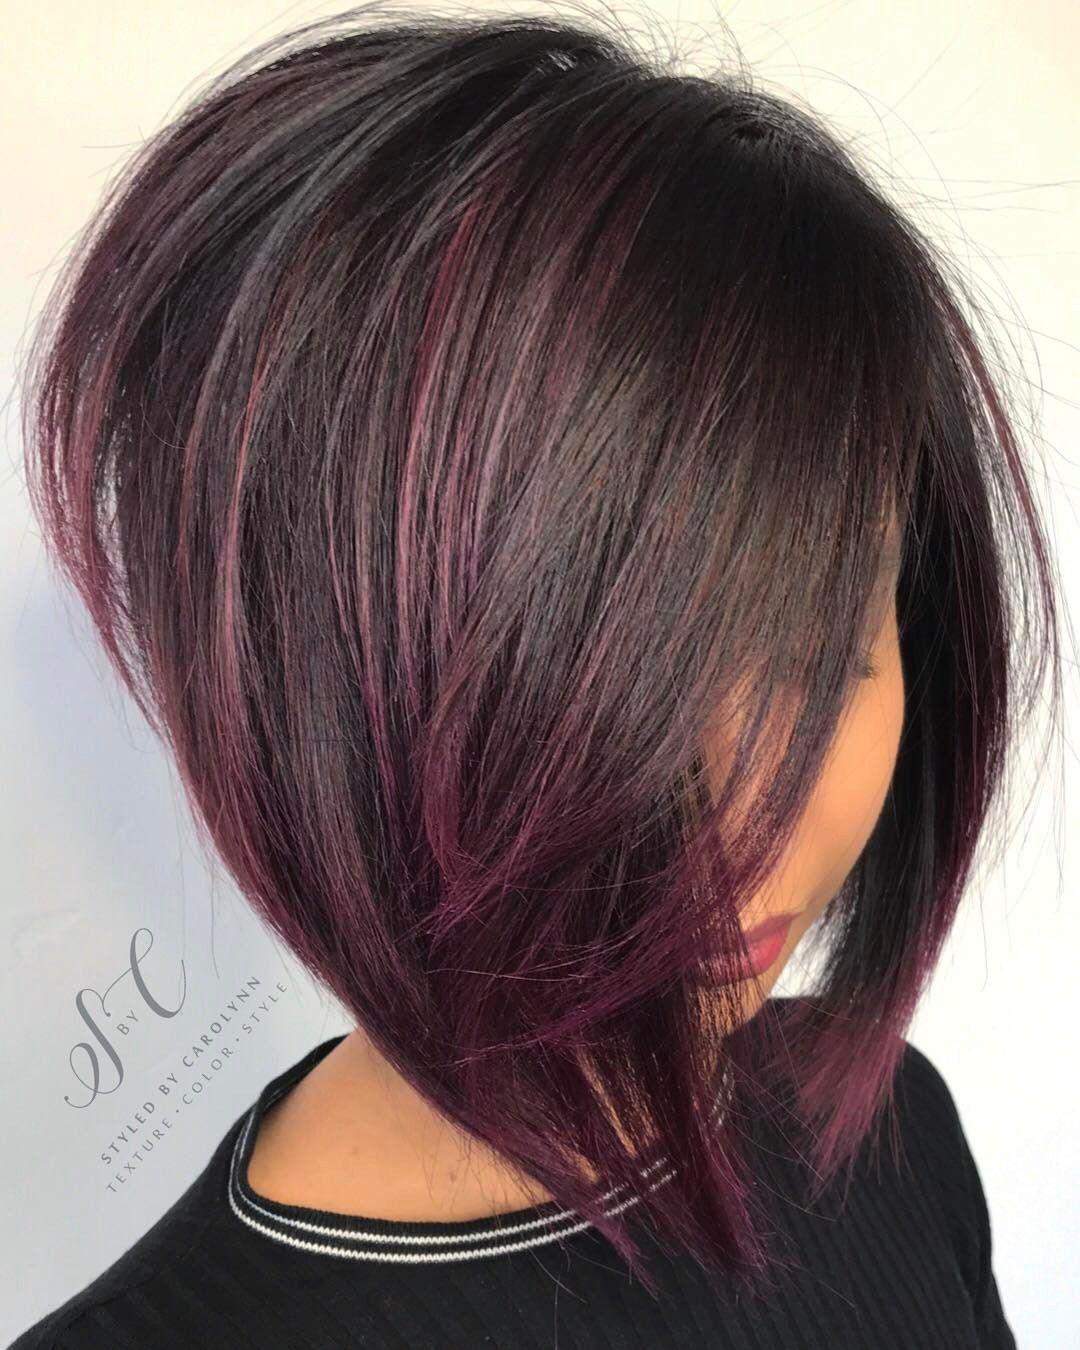 A Line Hairstyle Fade Haircut